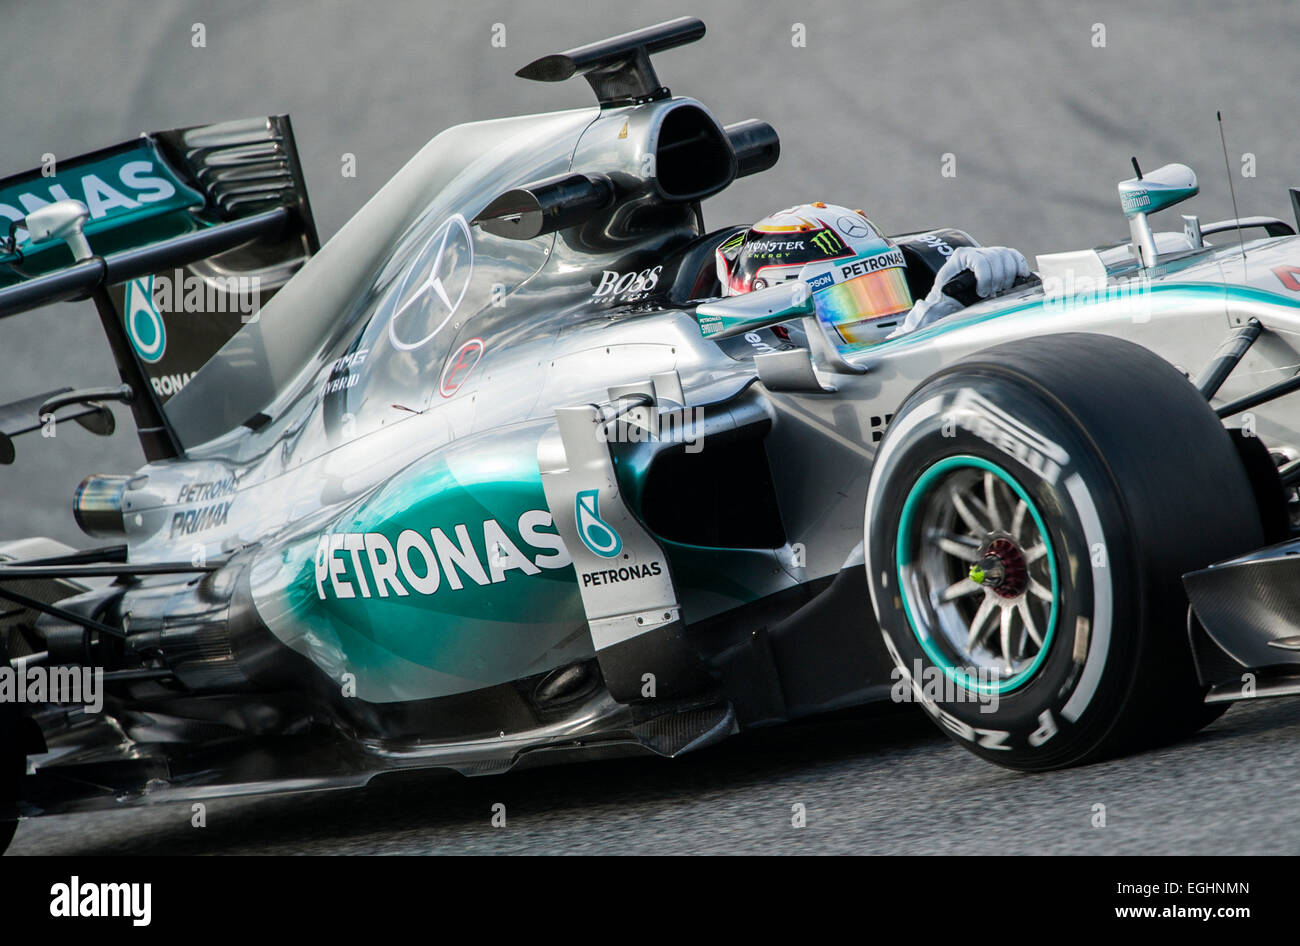 Lewis hamilton gbr mercedes benz amg petronas f1 team for Mercedes benz formula 1